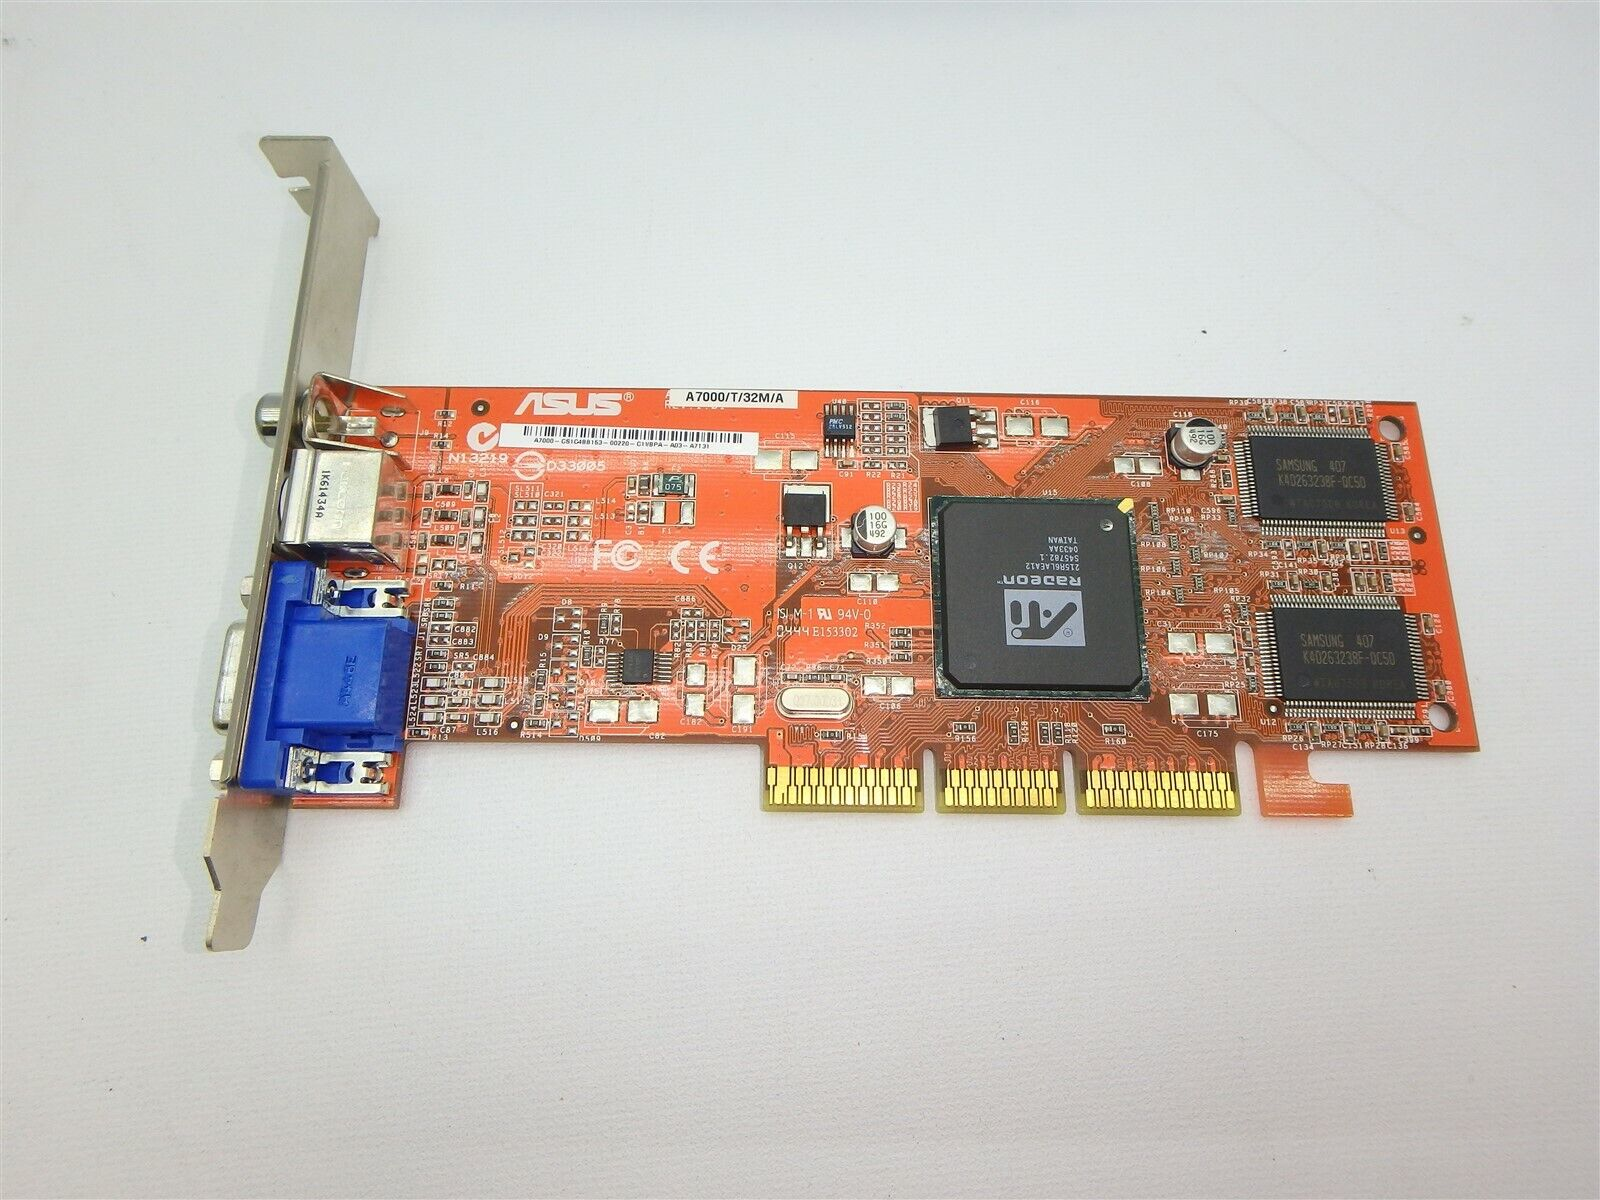 Lot of 15 Asus ATI Radeon A7000/T/32M/A 32MB AGP Graphics card